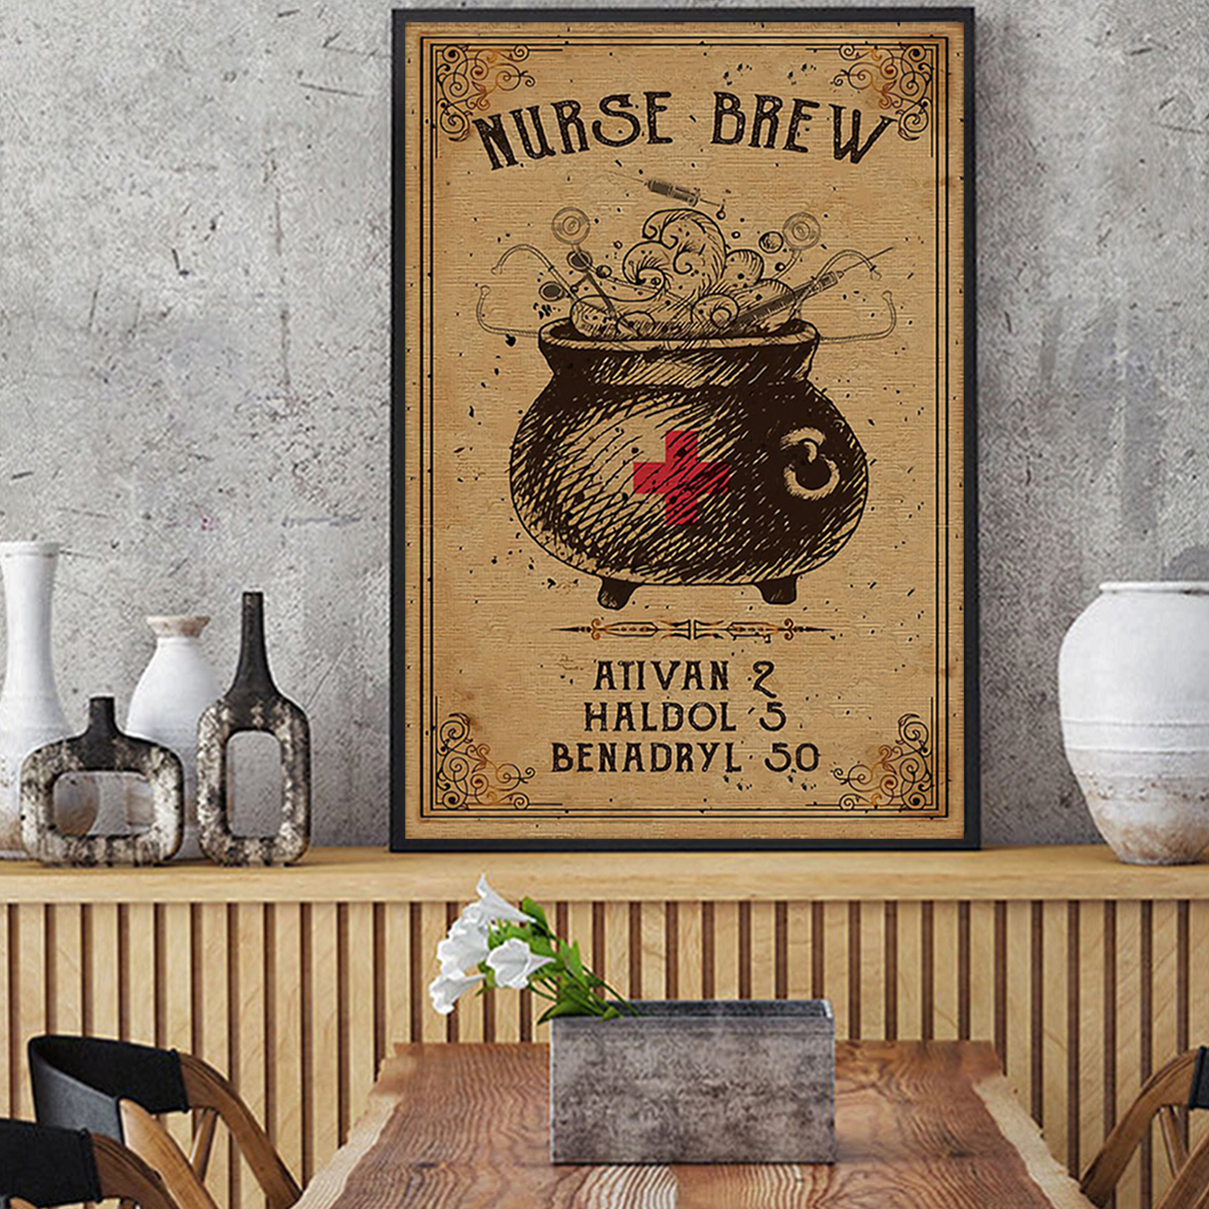 Nurse brew poster A3